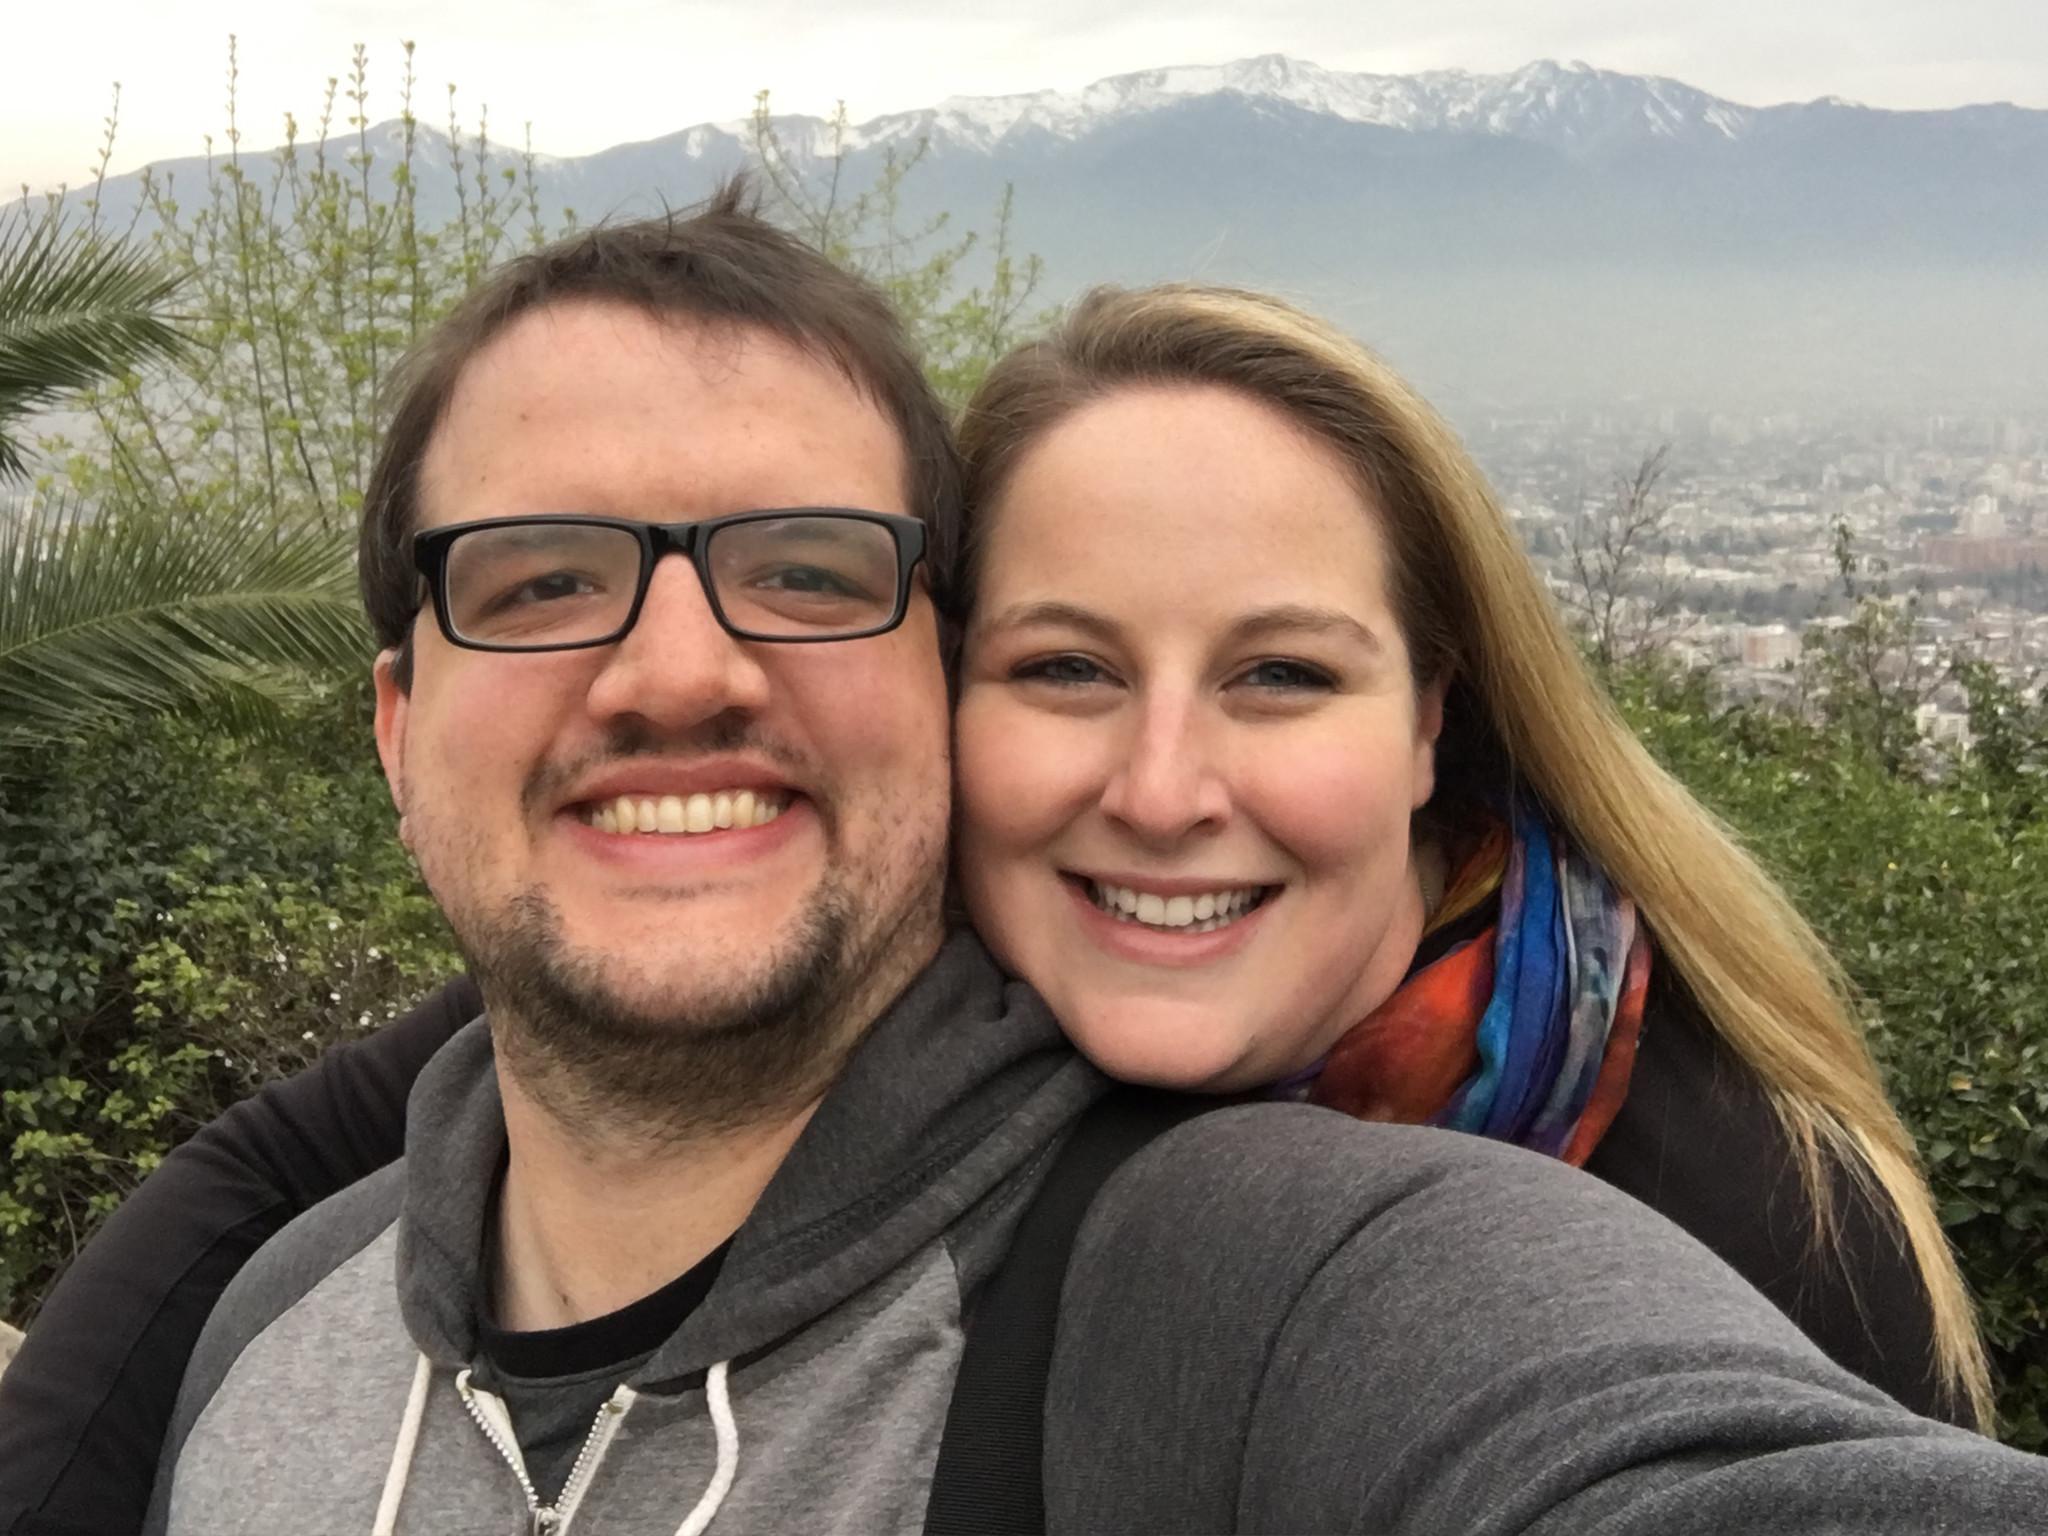 NYC couple highlight worries of pushing back weddings due to coronavirus